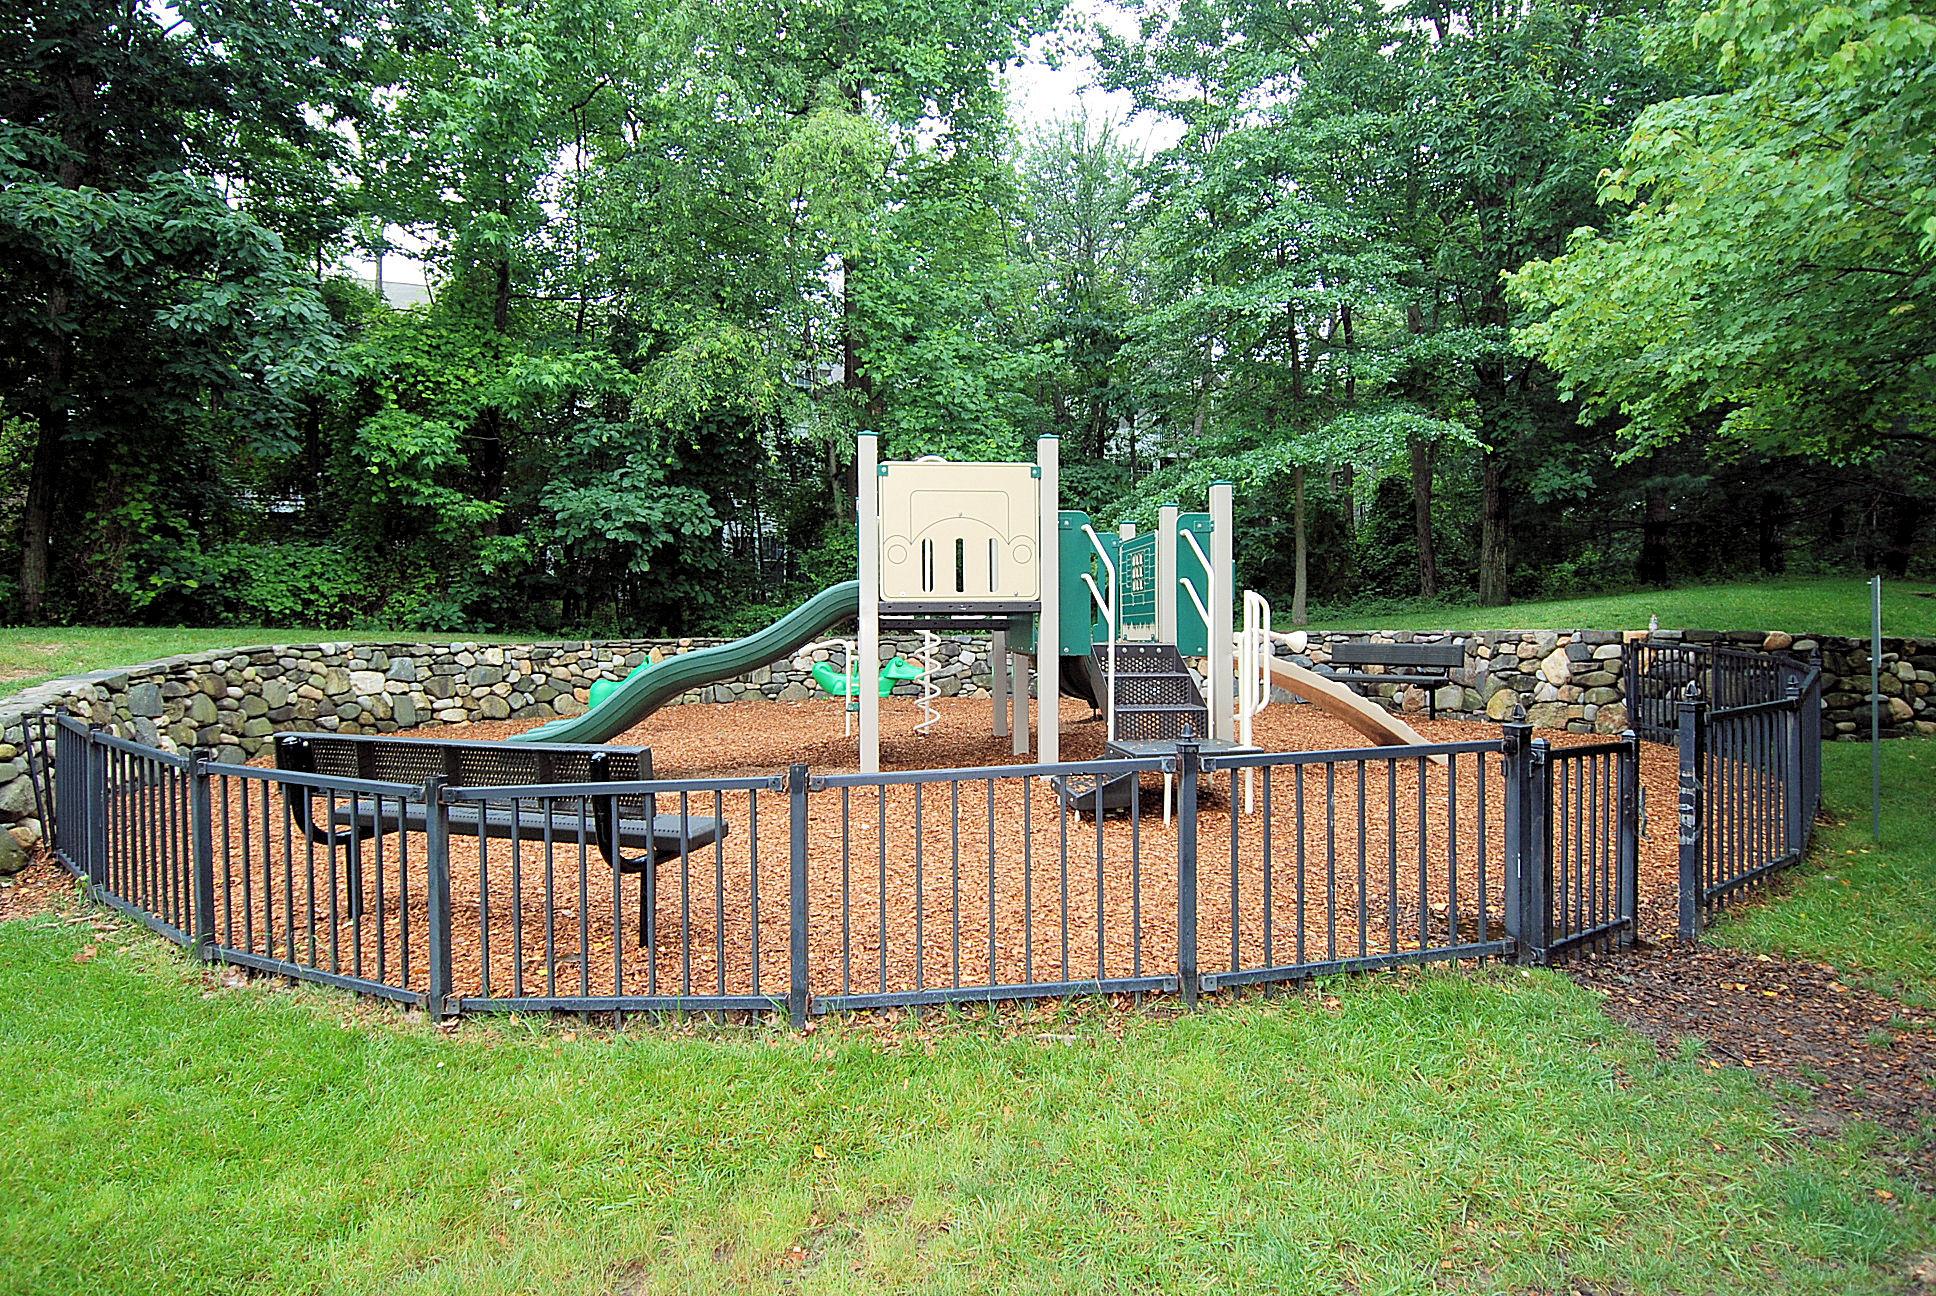 Piney Orchard playground